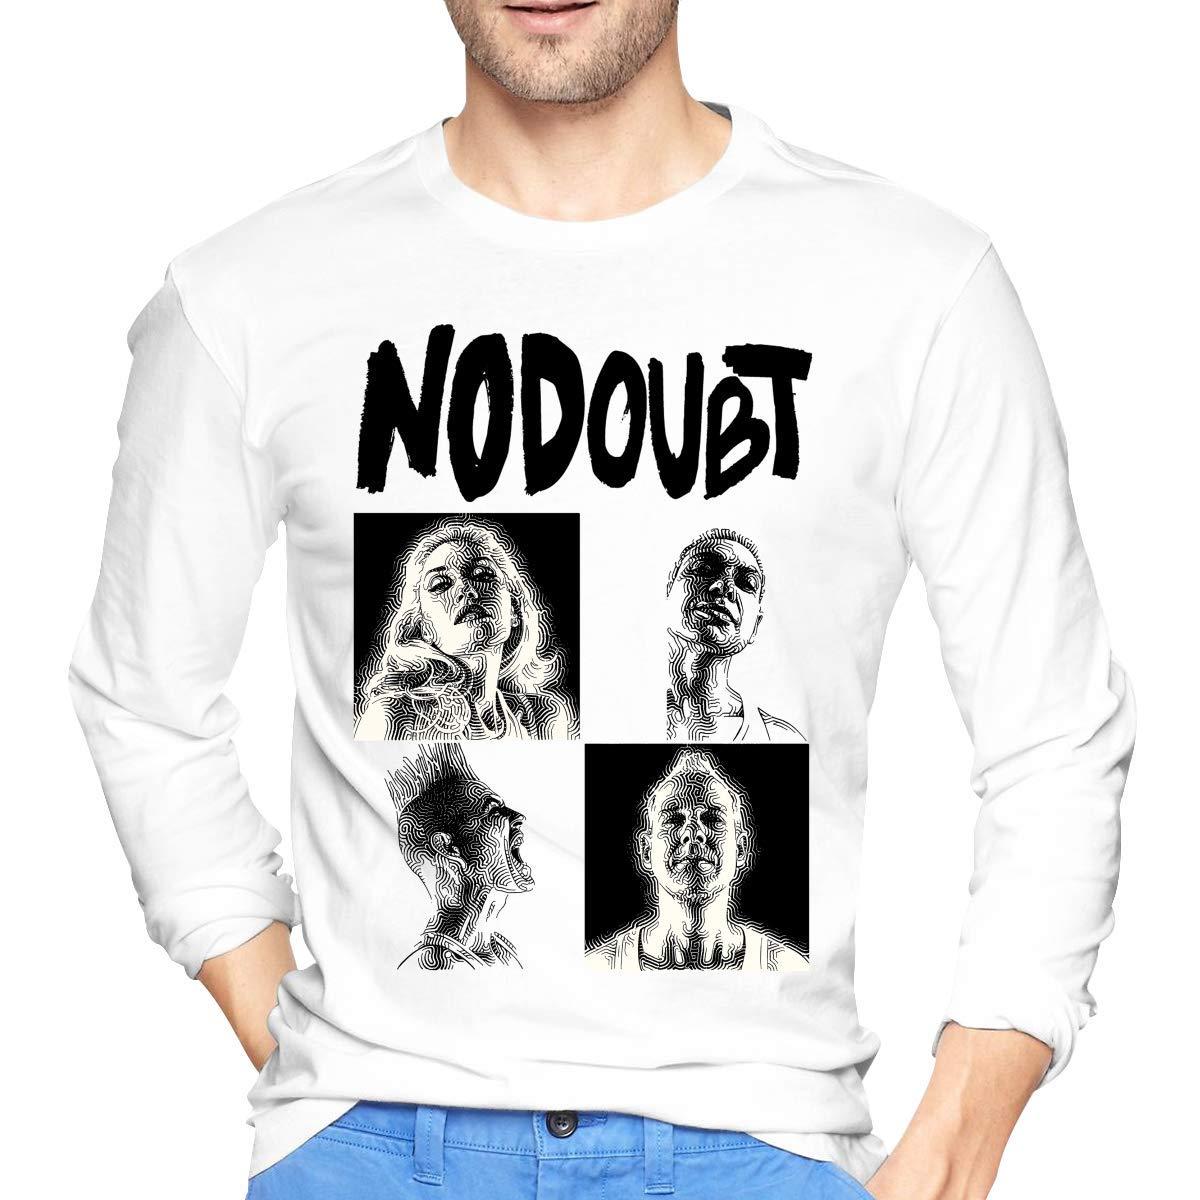 Fssatung S No Doubt Push And Shove T Shirts